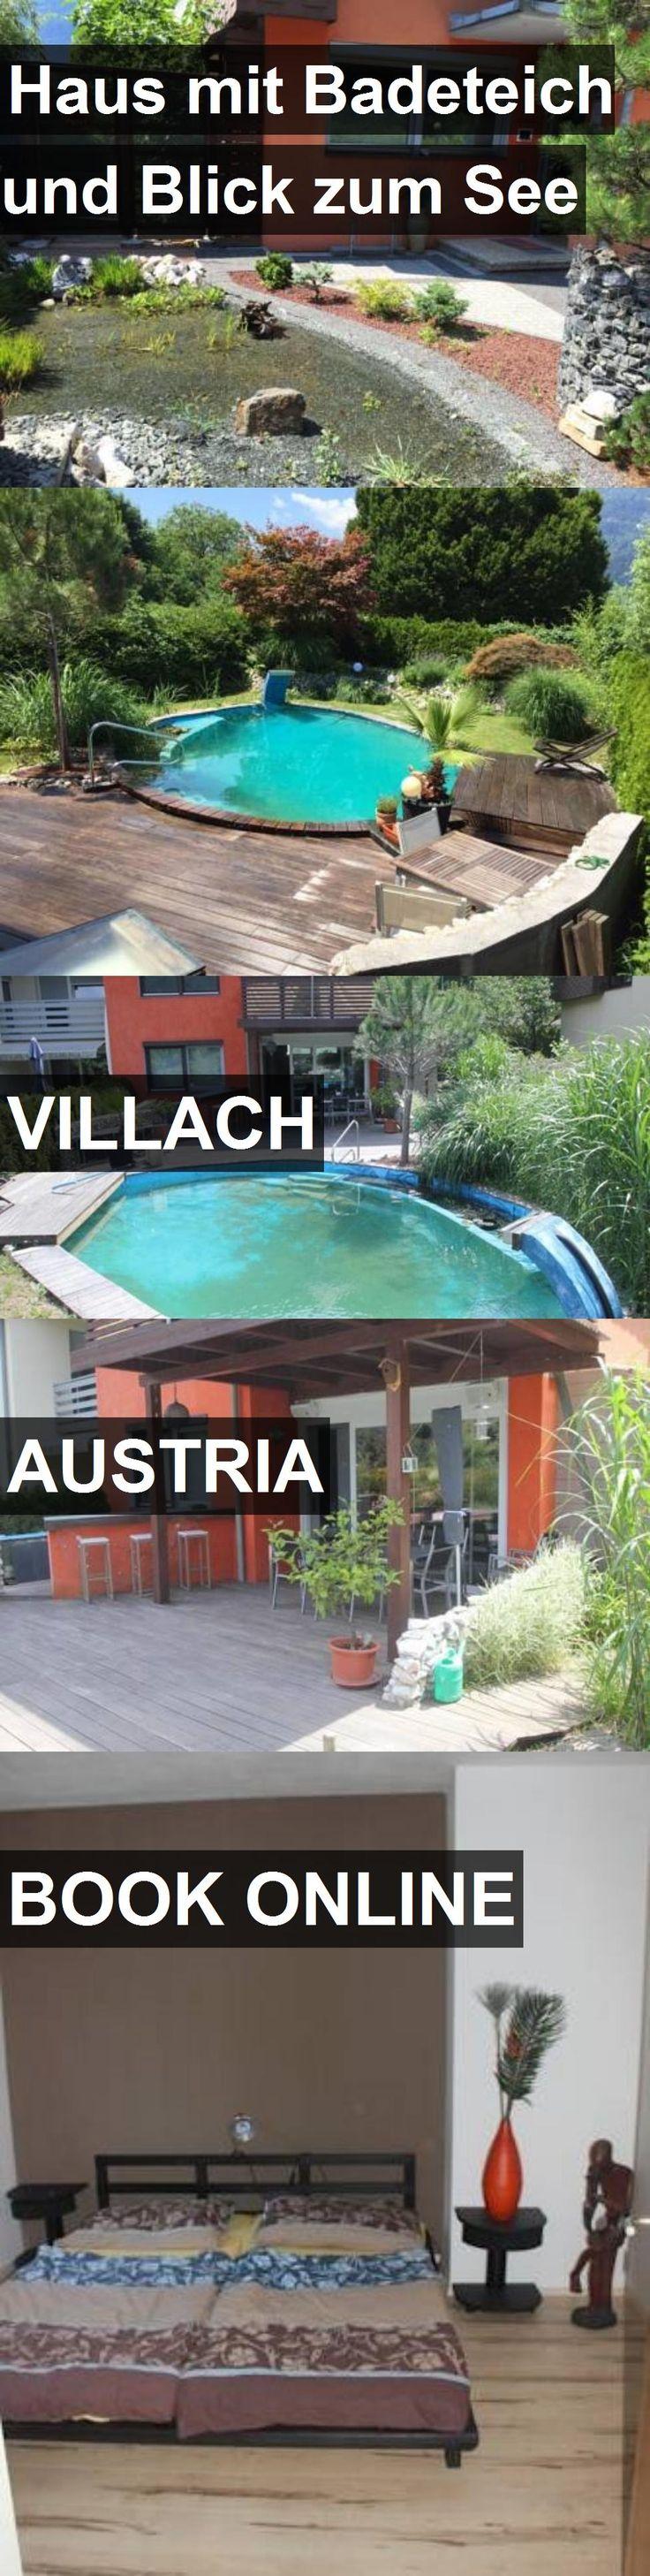 Hotel Haus mit Badeteich und Blick zum See in Villach, Austria. For more information, photos, reviews and best prices please follow the link. #Austria #Villach #travel #vacation #hotel